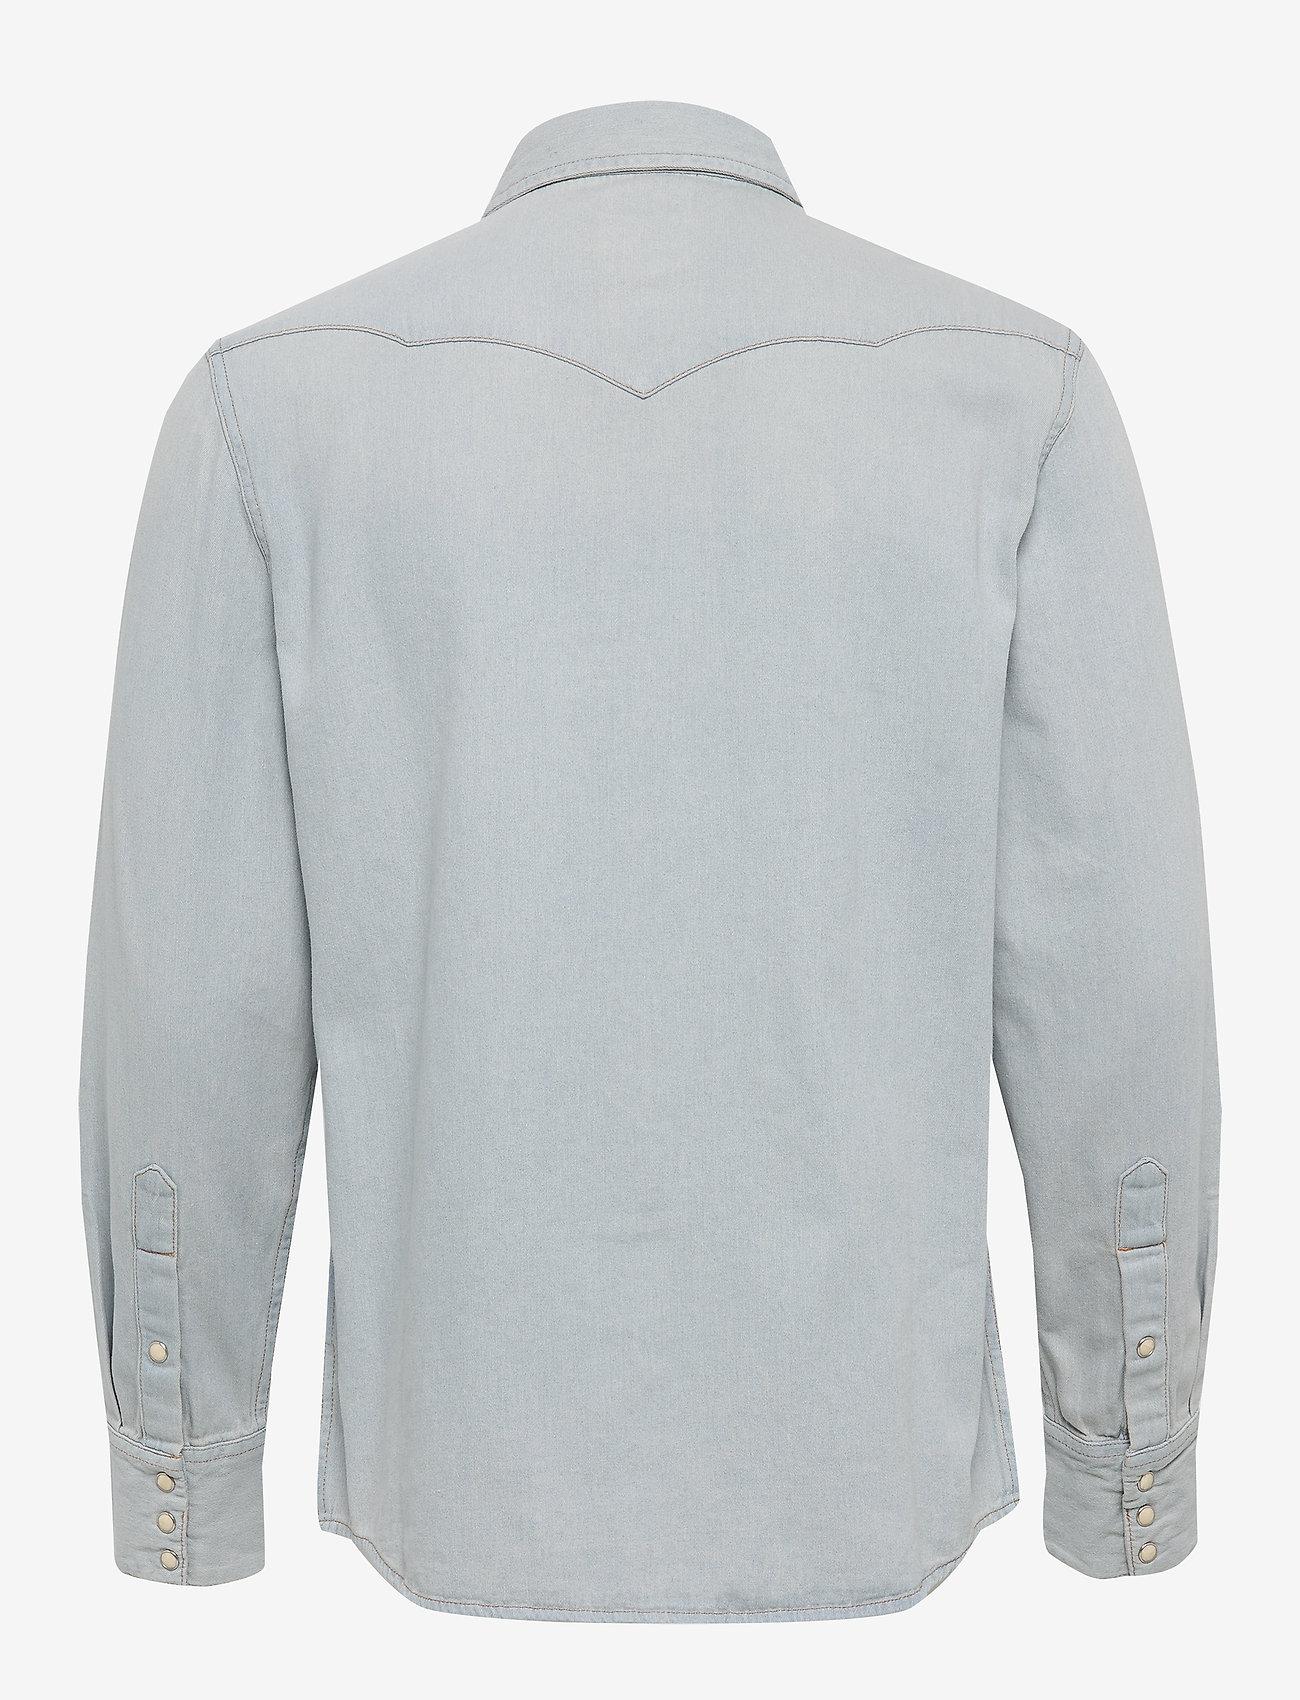 27mw Icon Shirt (Icons Bleach) - Wrangler VBeAwm